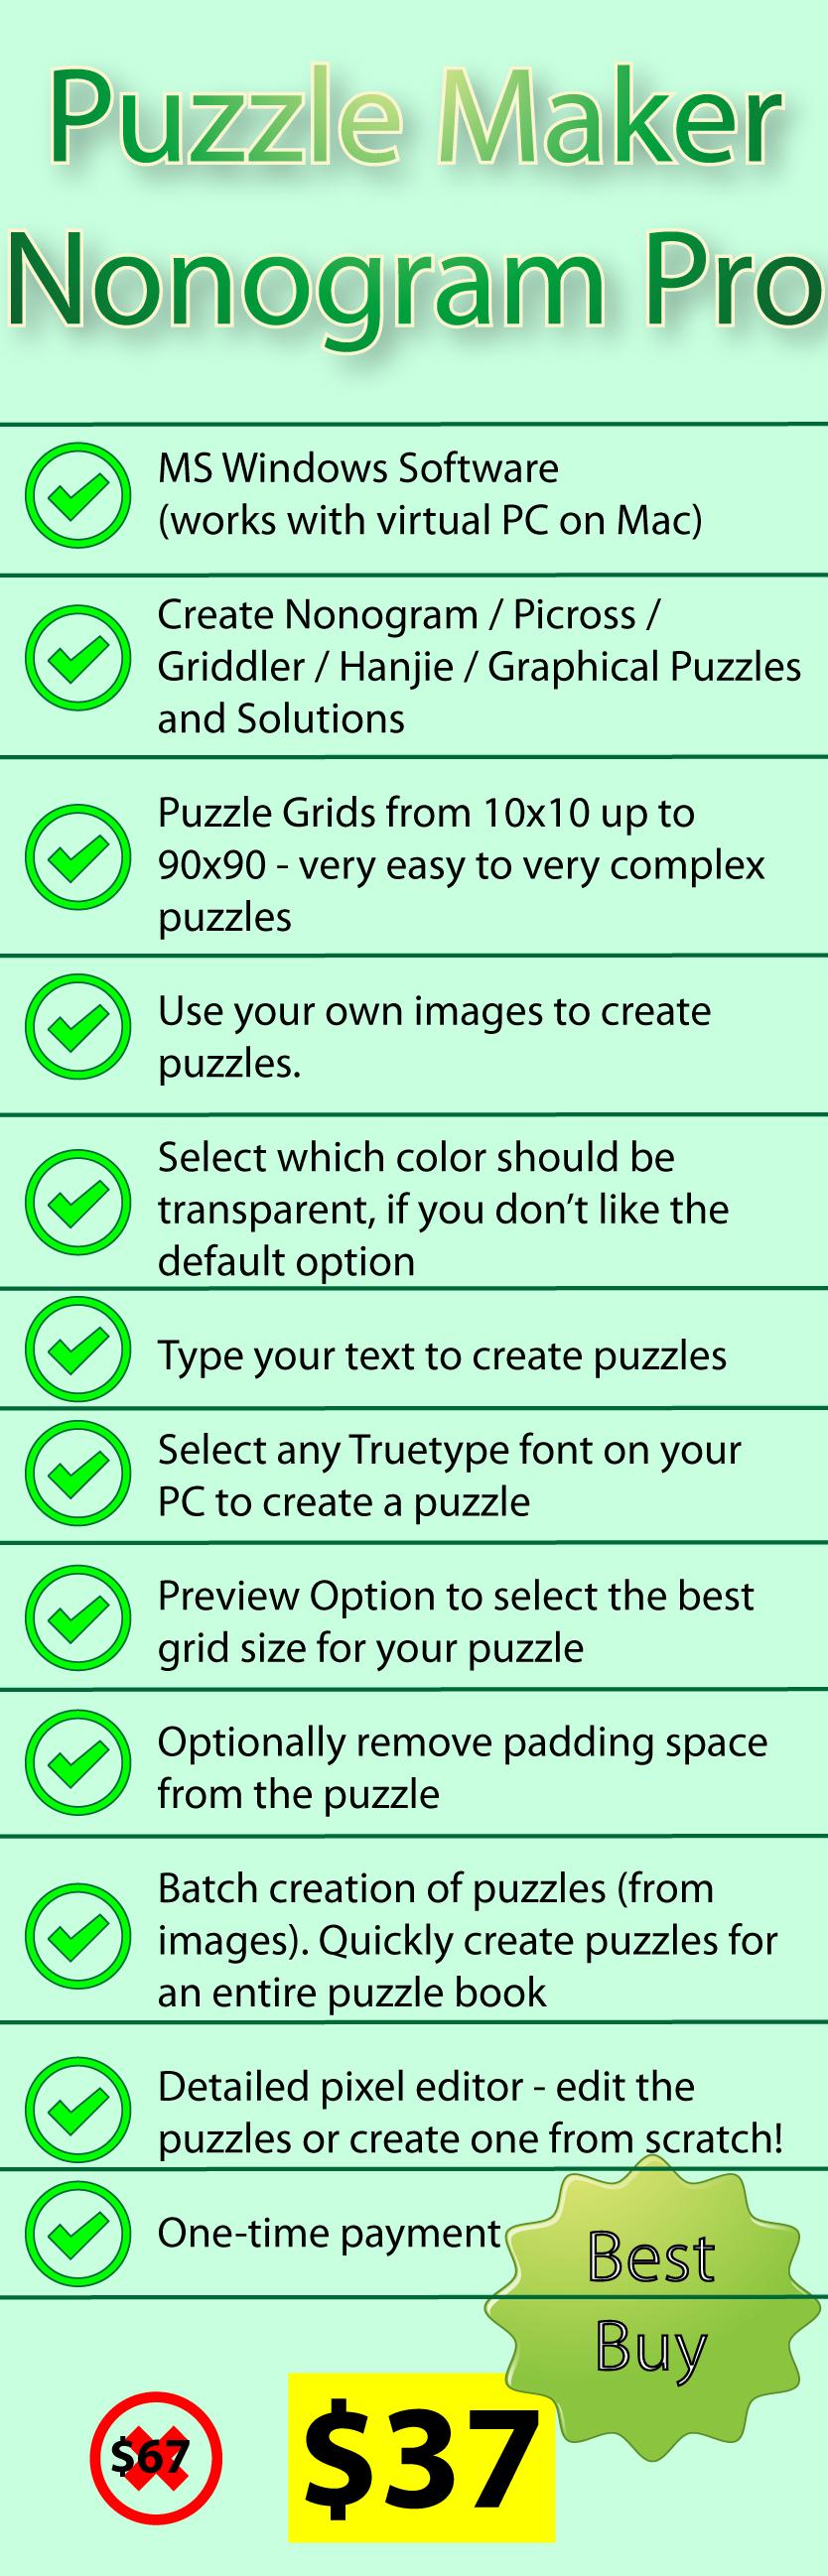 Puzzle Maker Nonogram | Designing for Print on Demand